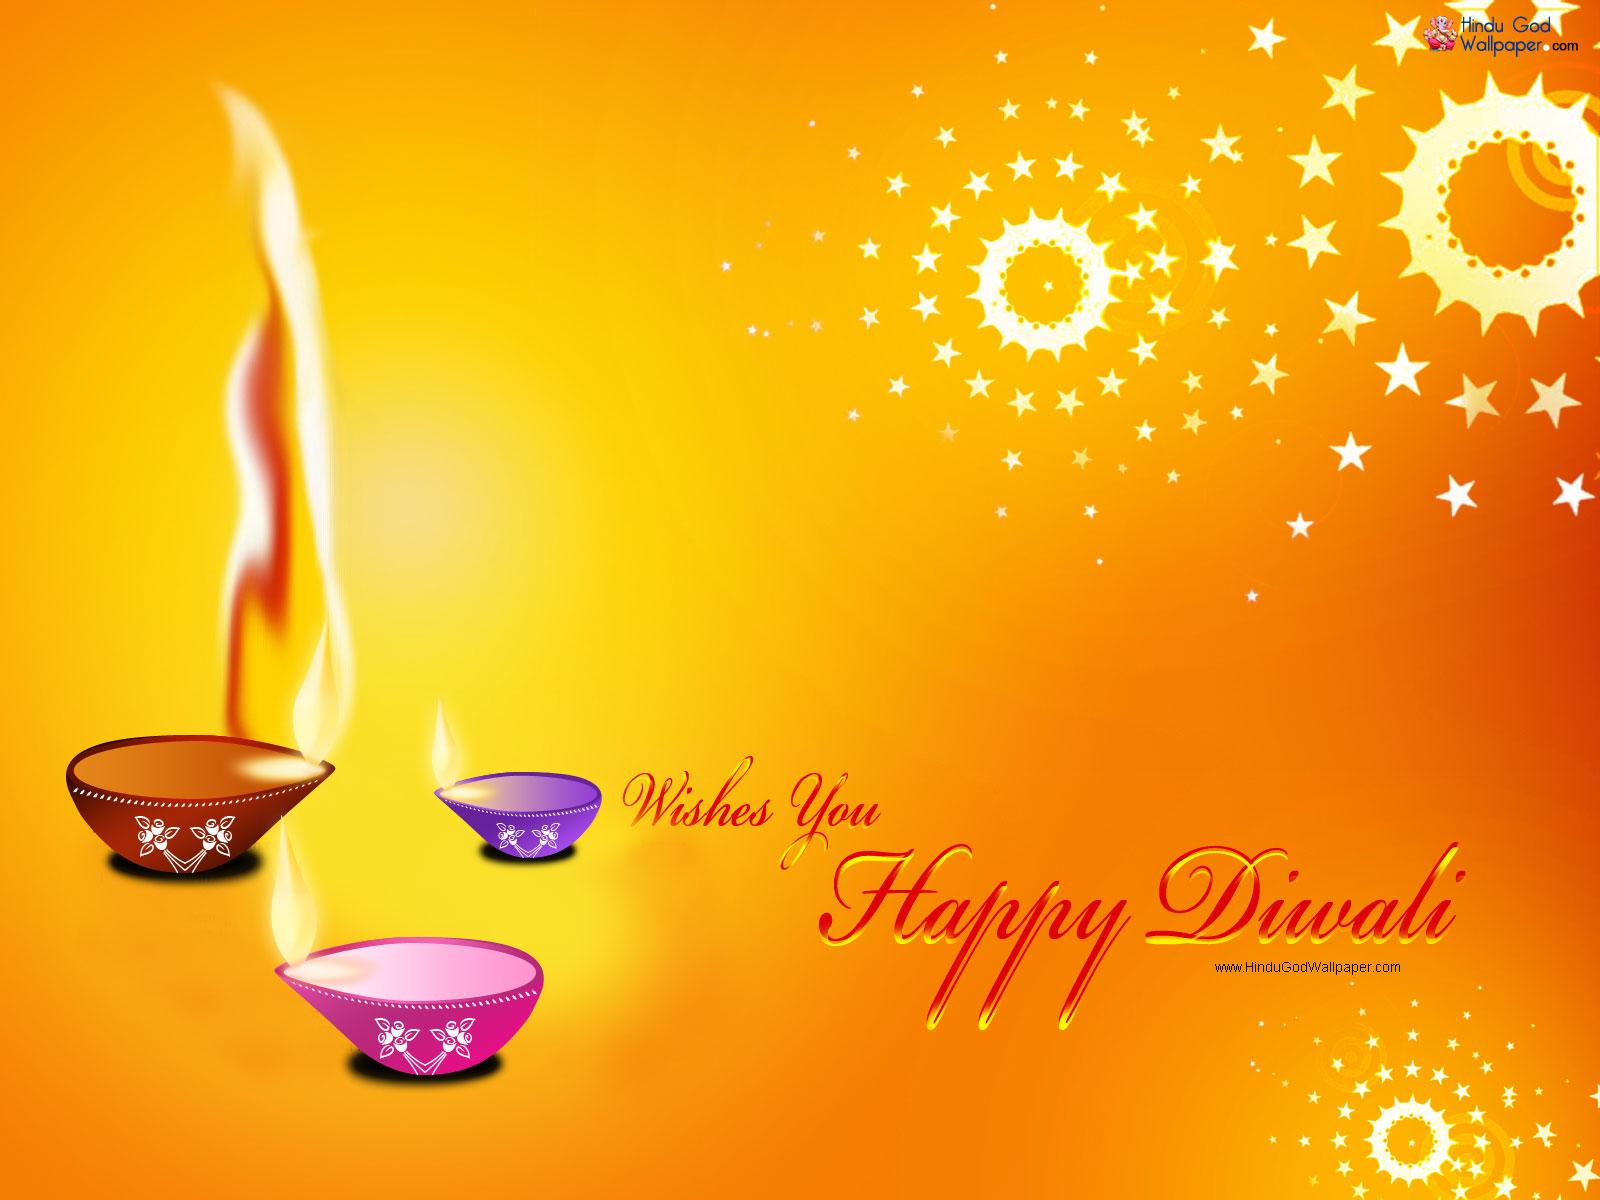 Wallpaper download of 2017 - Happy Diwali Wallpaper 2017